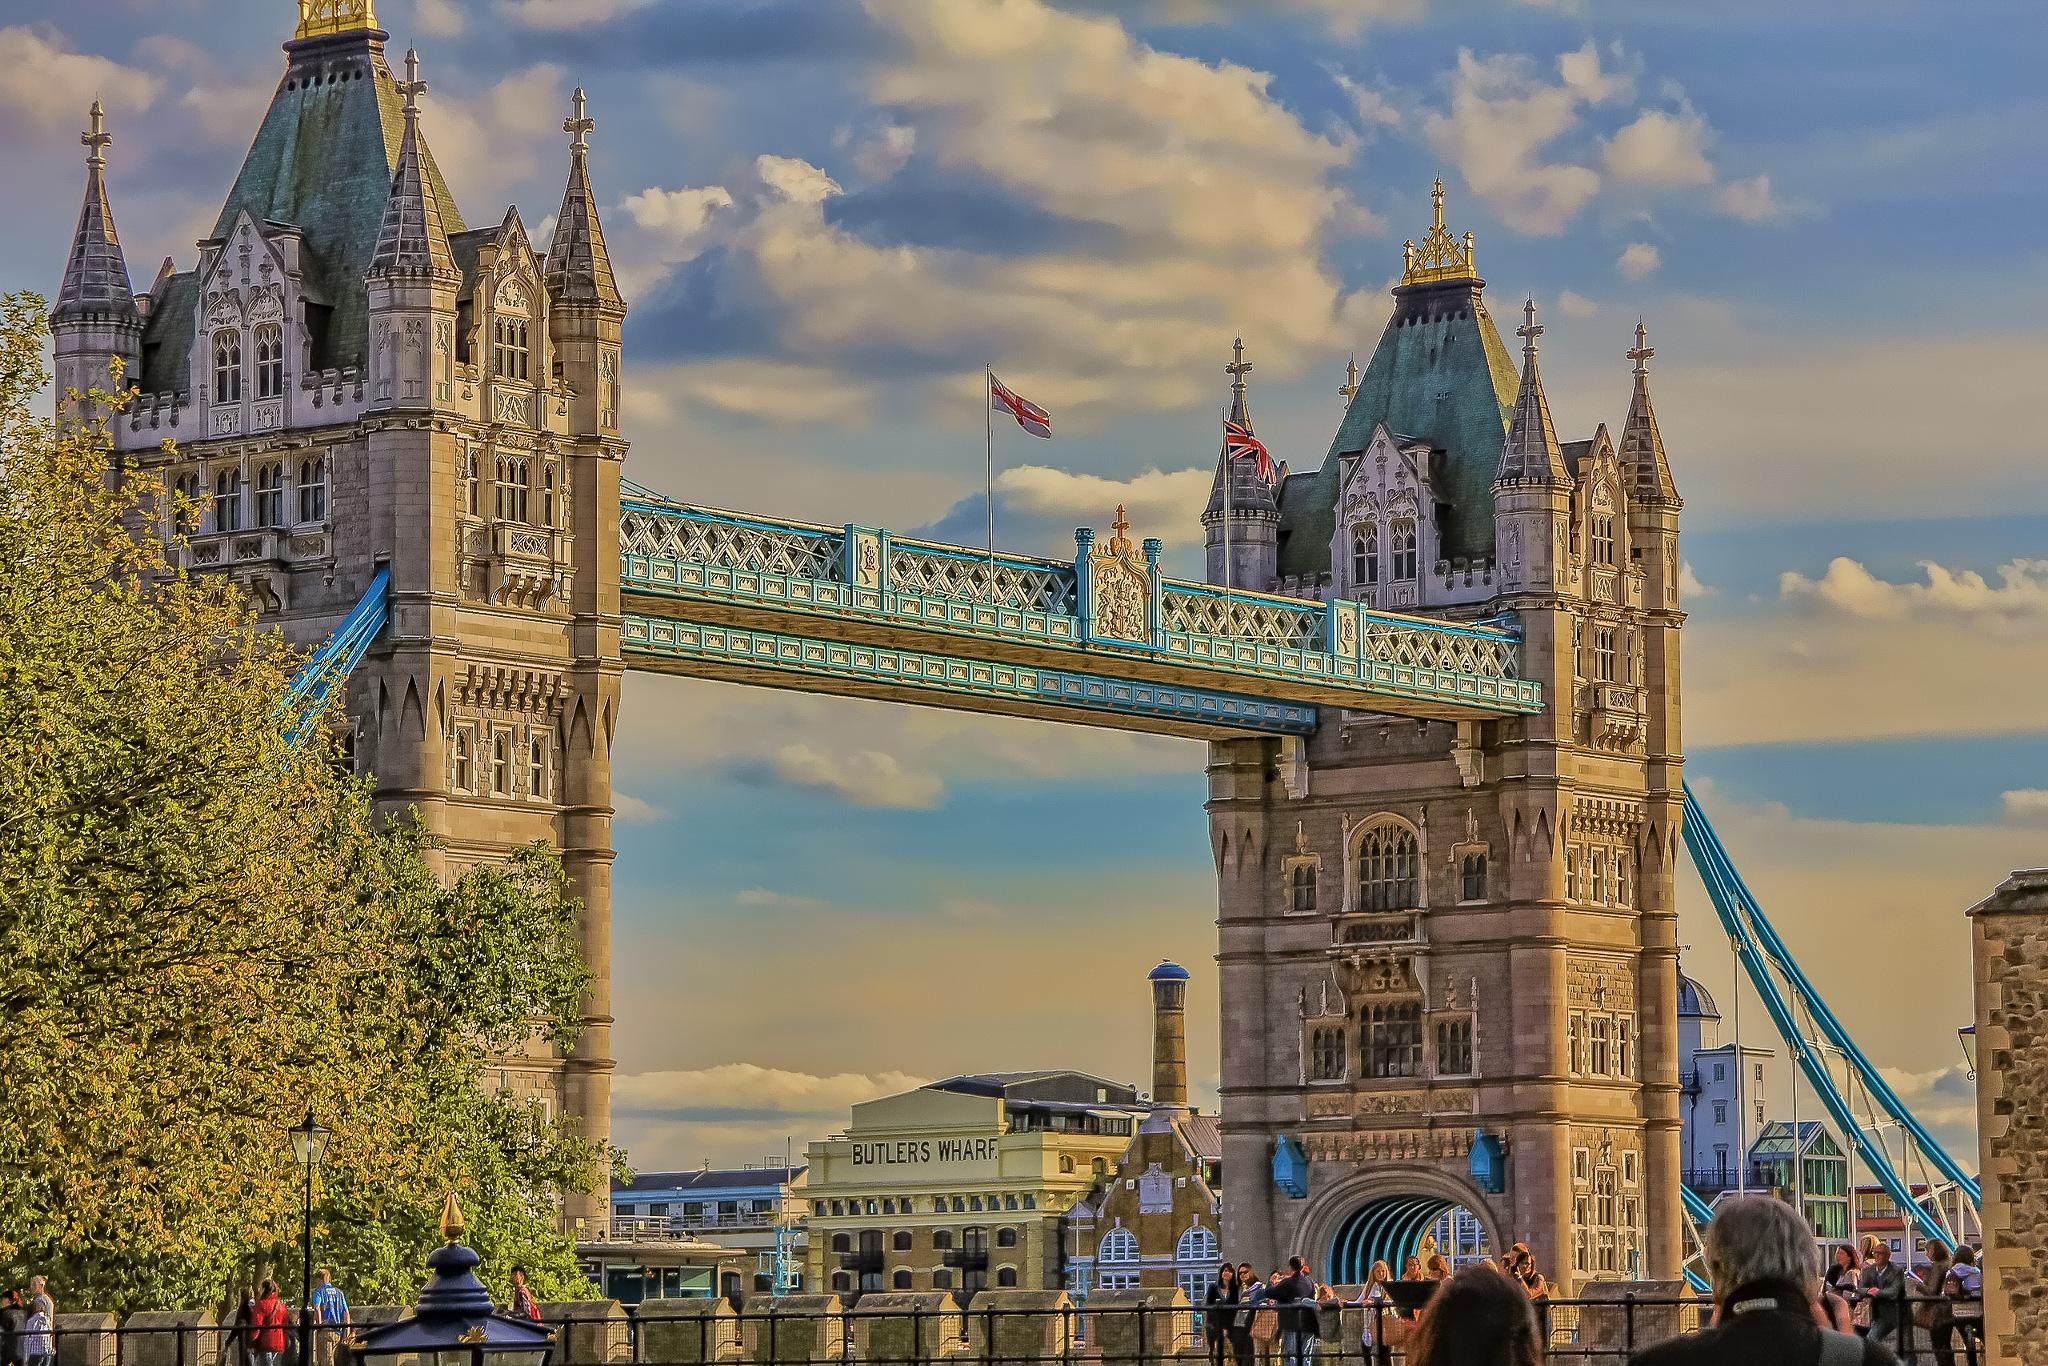 London Bridge by Ruth Sano